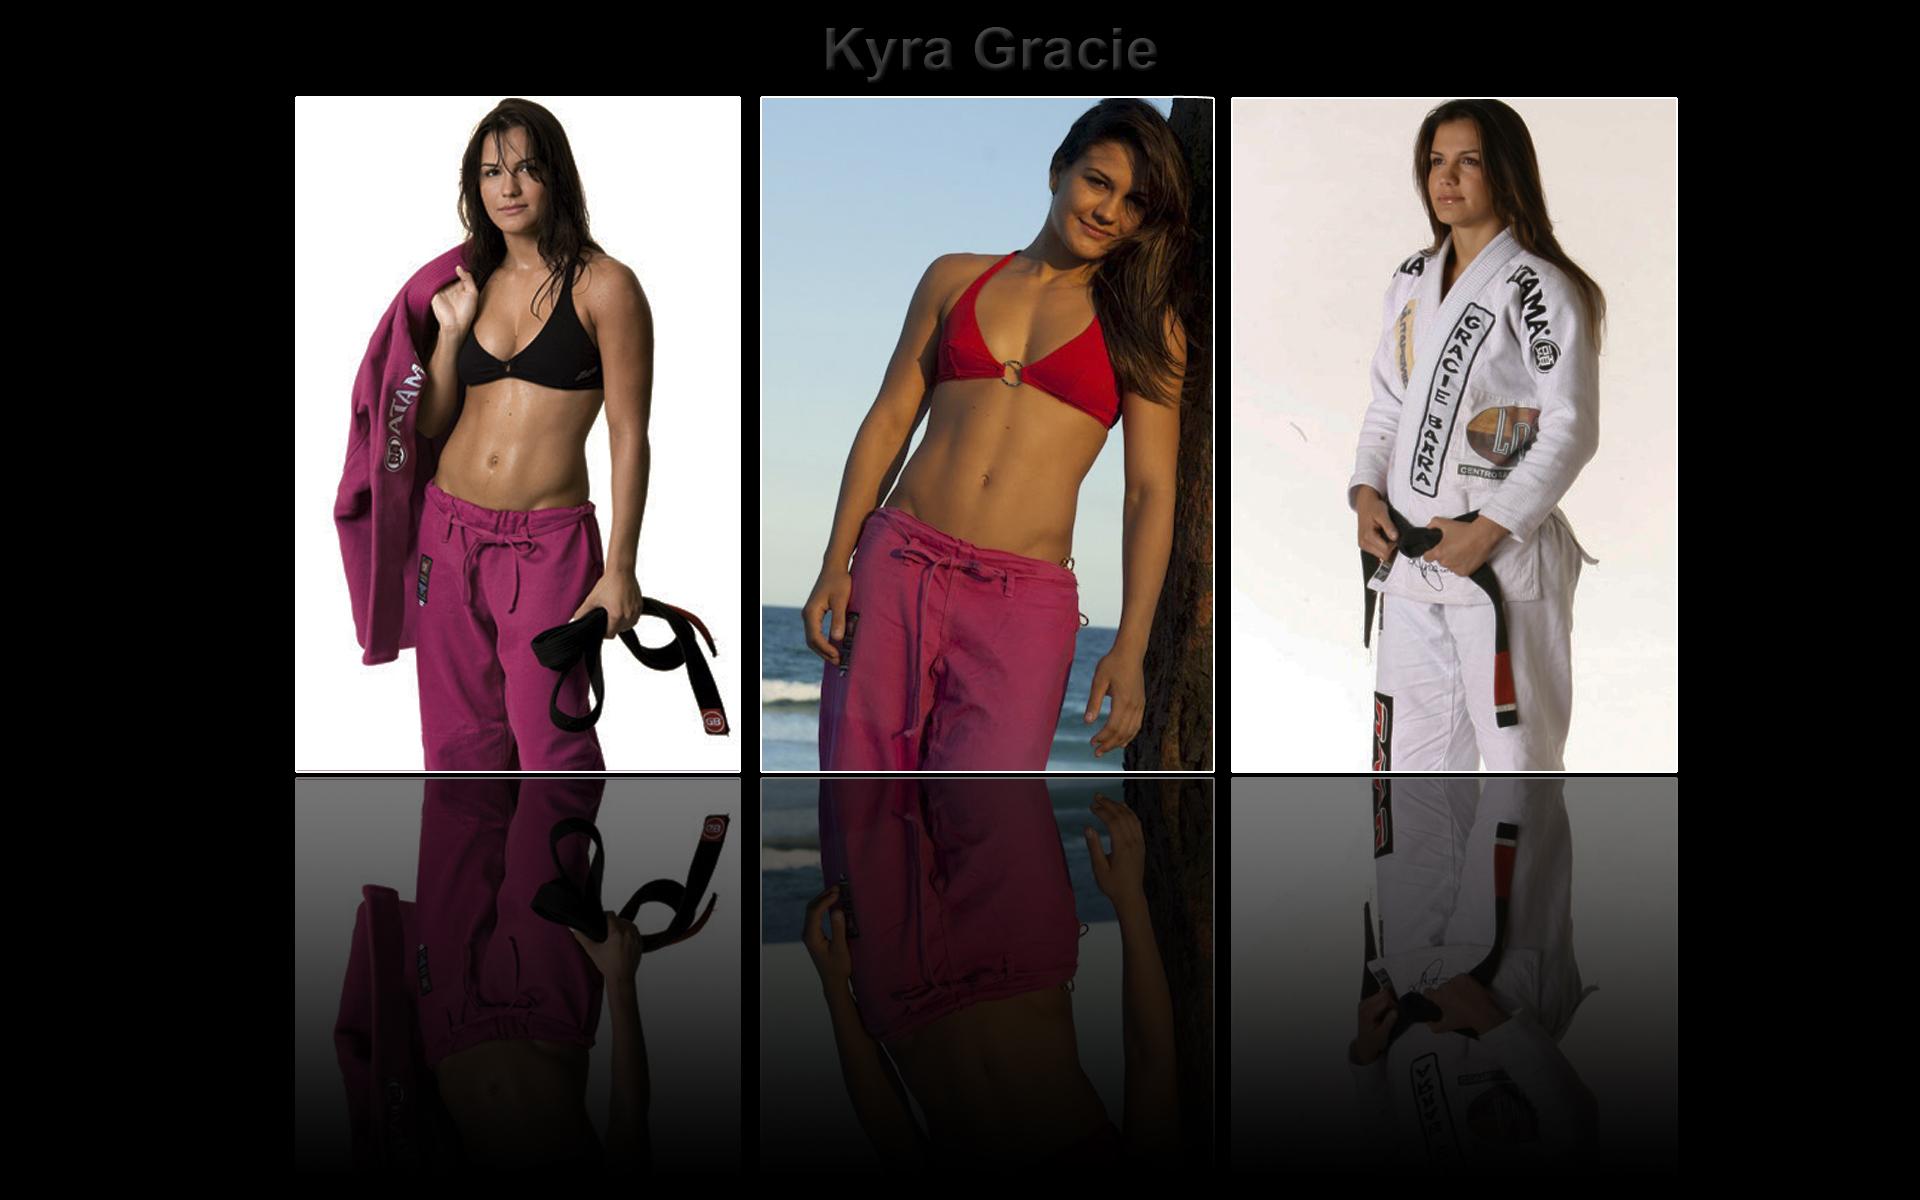 Kyra Gracie Wallpaper 3 By Balhirath